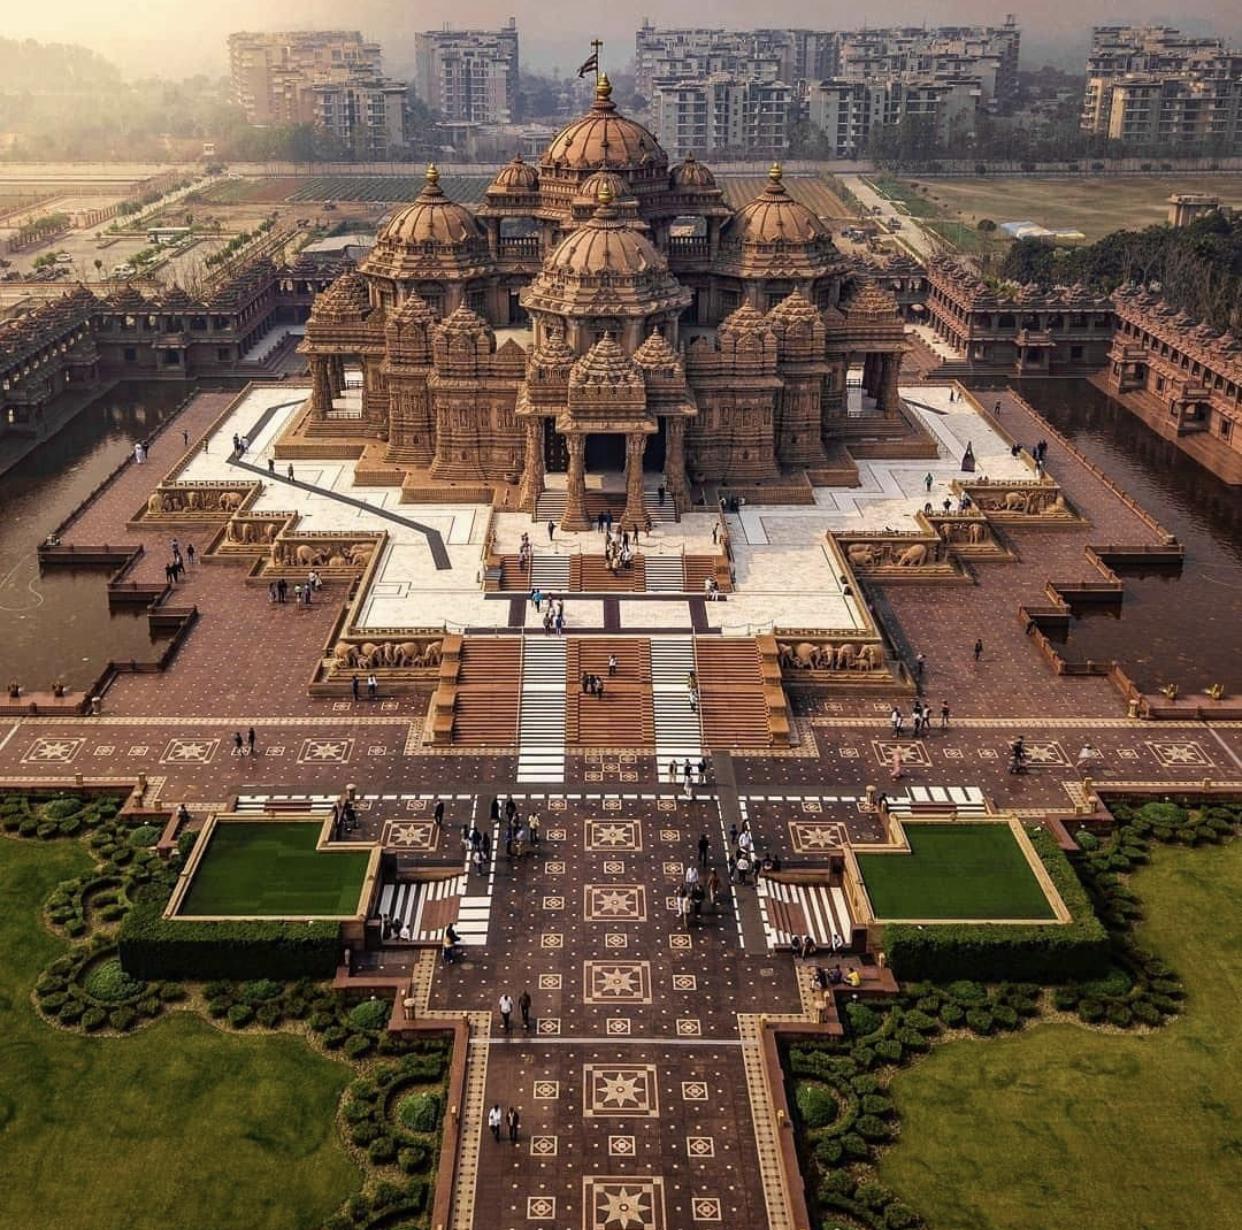 Swaminarayan Akshardham Complex (Akshardham Temple) Noida Mor, Pandav  Nagar, New Delhi, Delhi, India : HinduTemplesRock